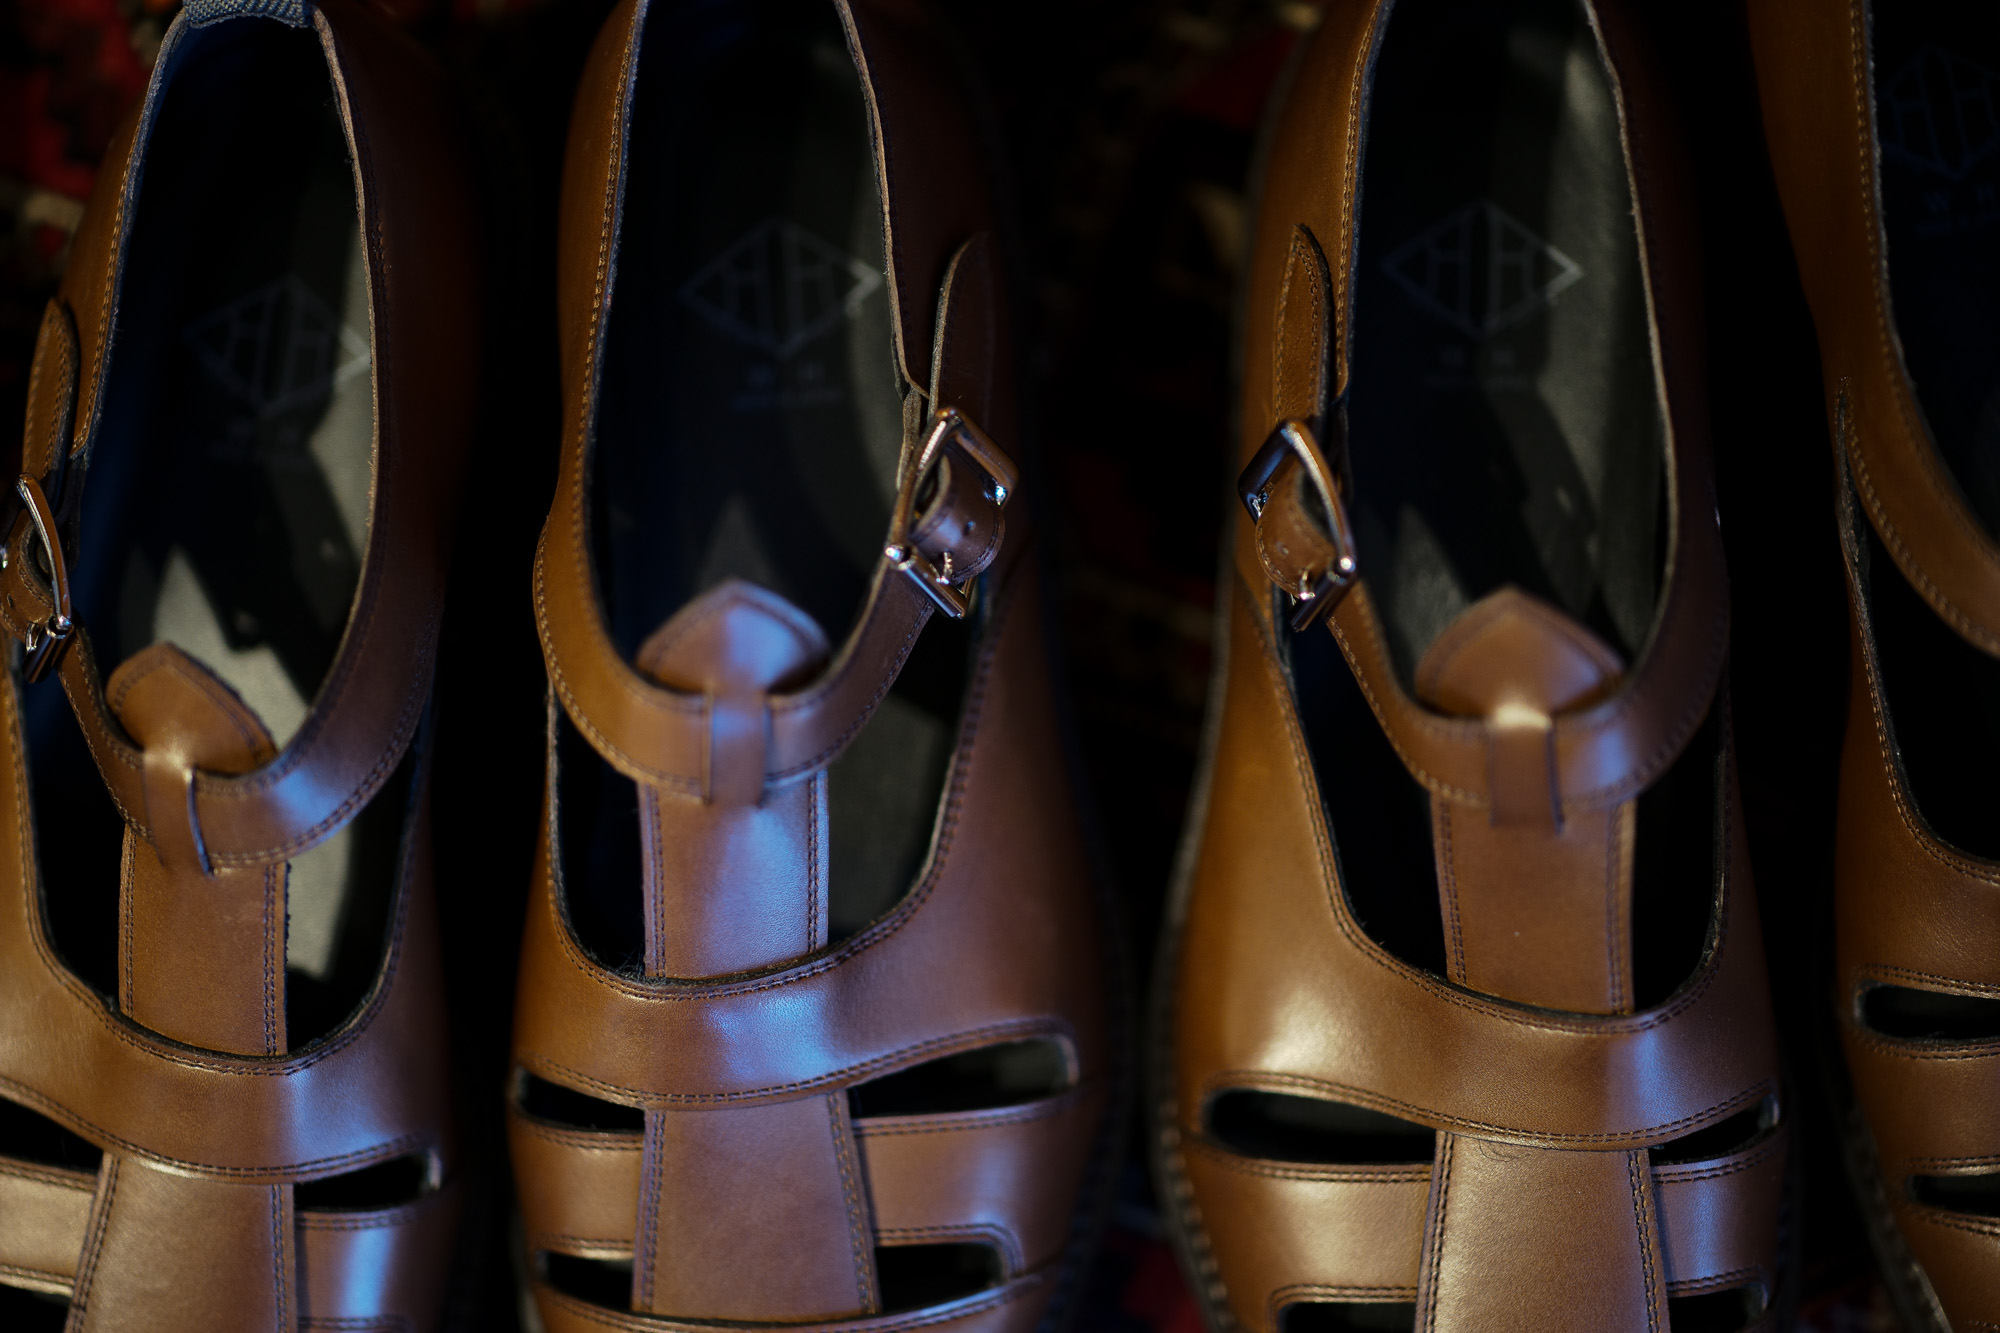 WH (ダブルエイチ) WH-0900 Gurkha Sandals Birdie Last (バーディラスト) ANNONAY Vocalou Calf Leather グルカサンダル ANT BROWN (アンティークブラウン) MADE IN JAPAN (日本製) 2019 春夏新作 wh0900 サンダル グルカ altoediritto アルトエデリット